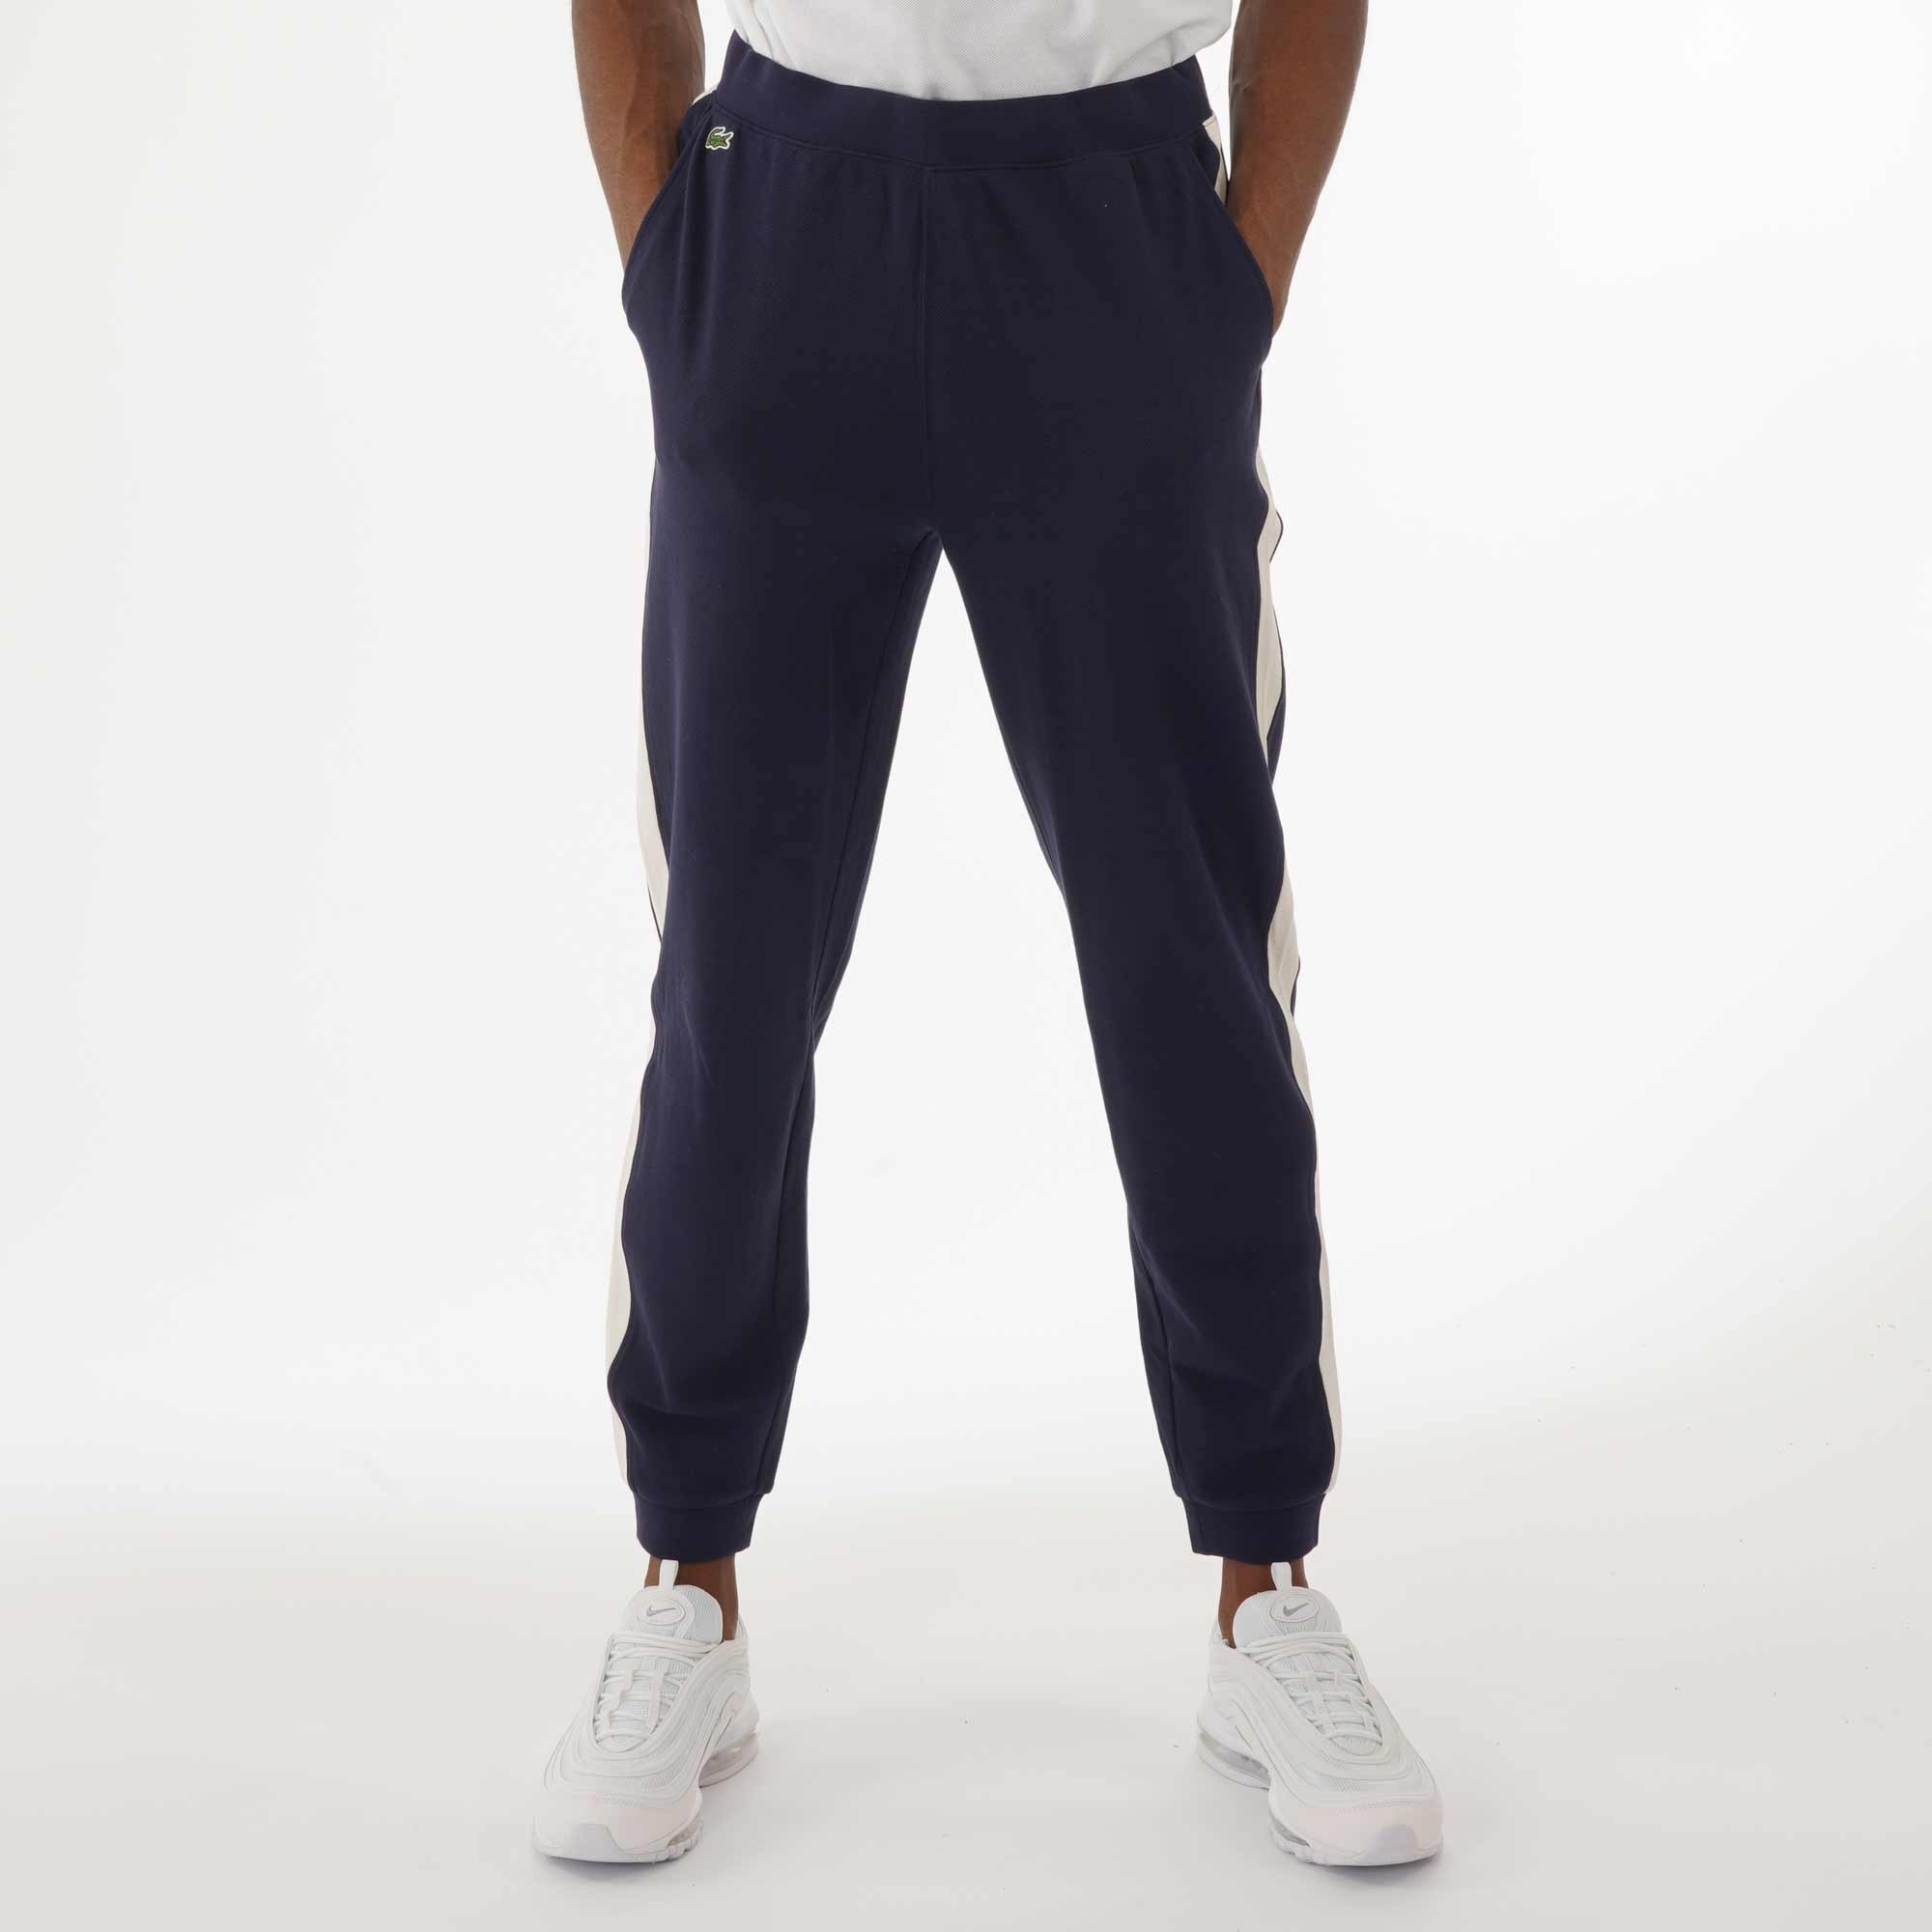 3a5f6bb216 Colour Block Piqué Fleece Sweatpants - Navy & White